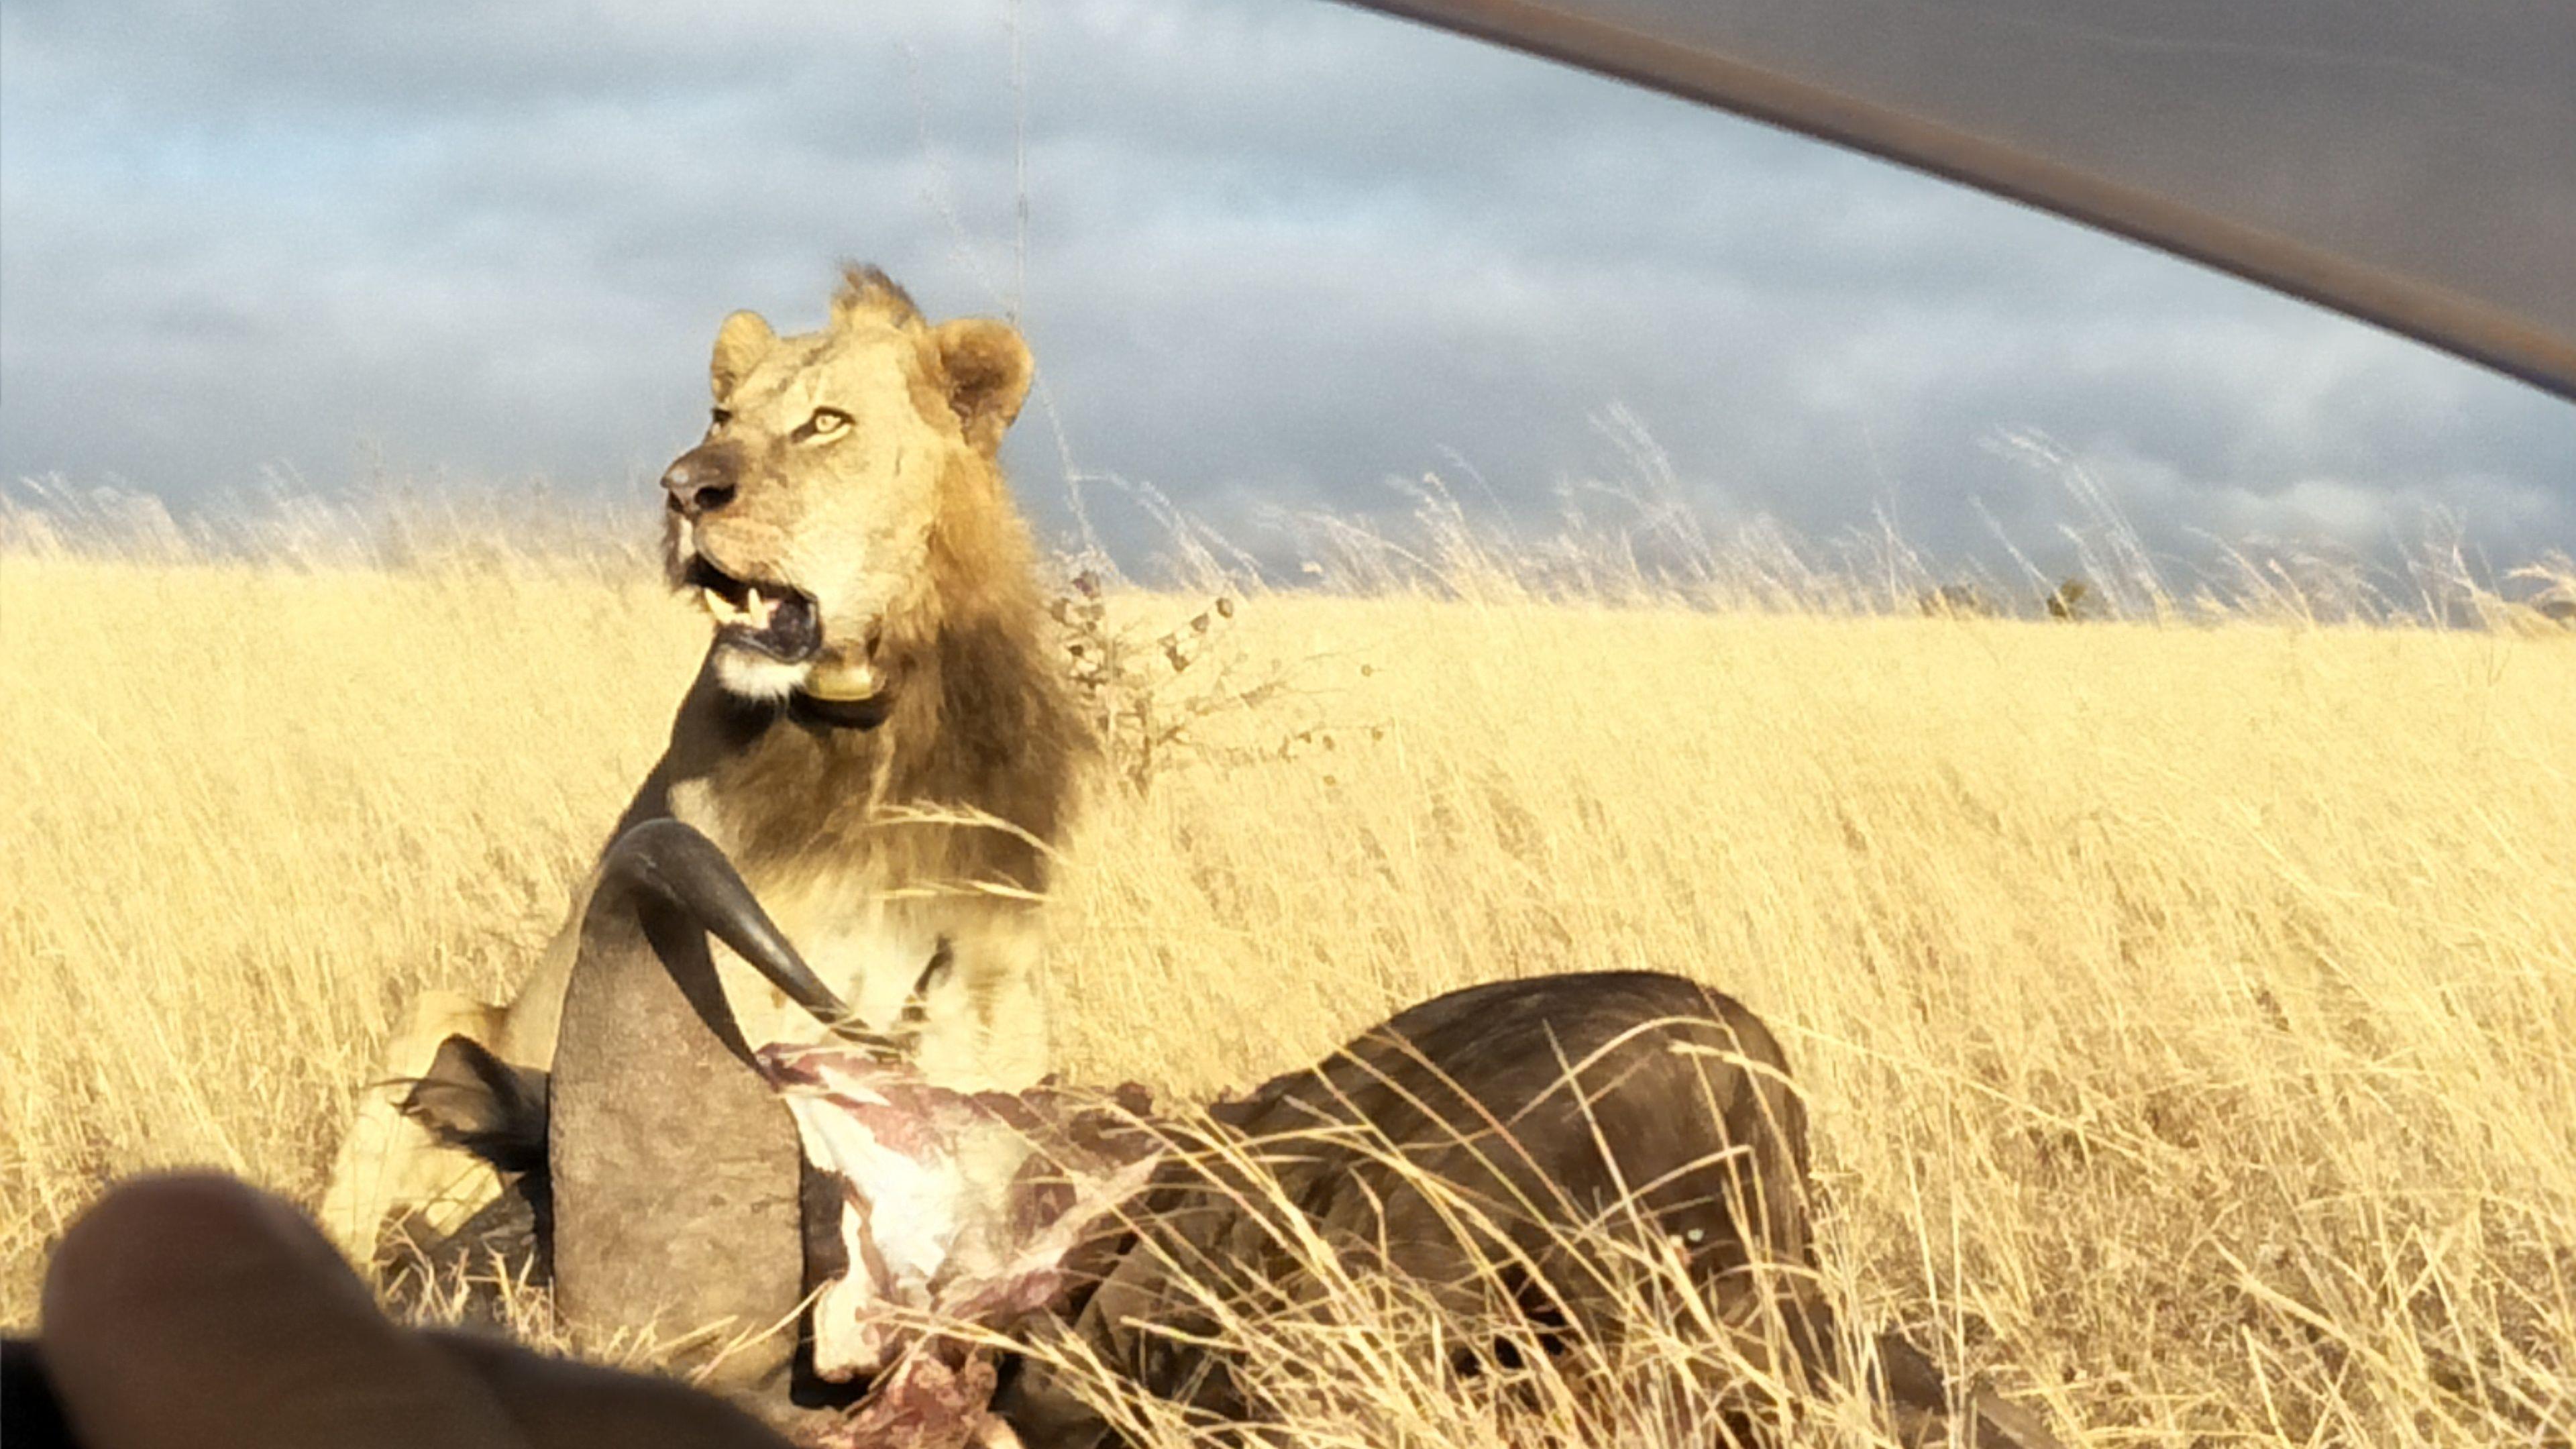 Stunning views of wildlife on the Nairobi National Park tour